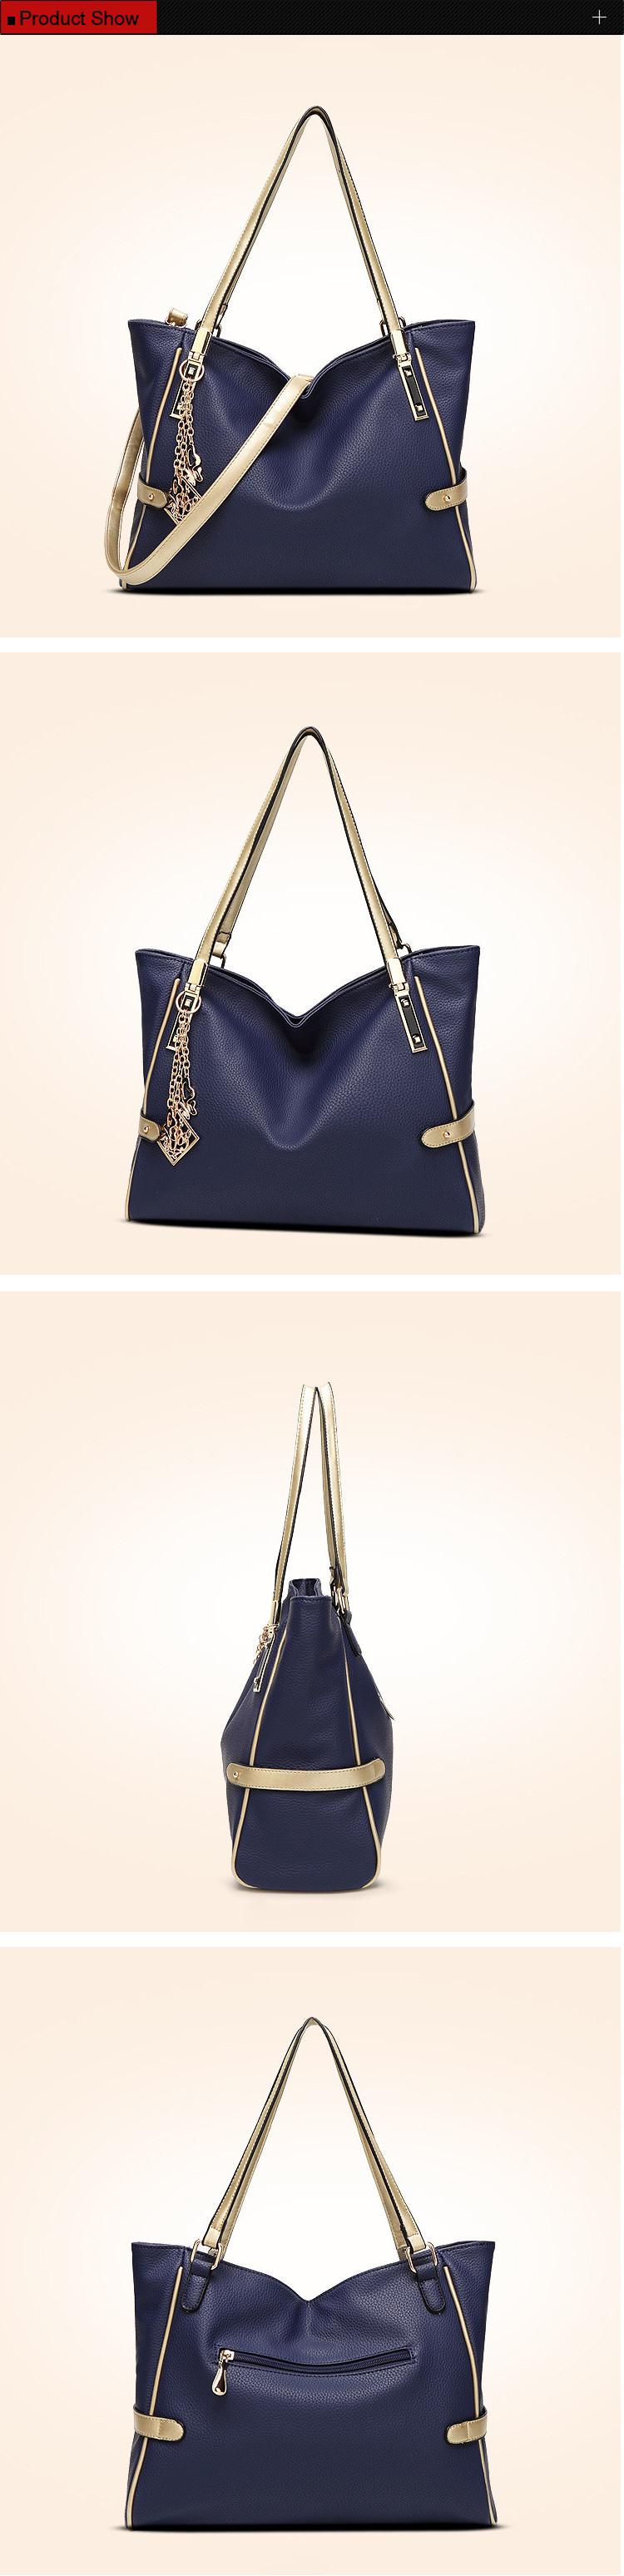 woman-handbag3